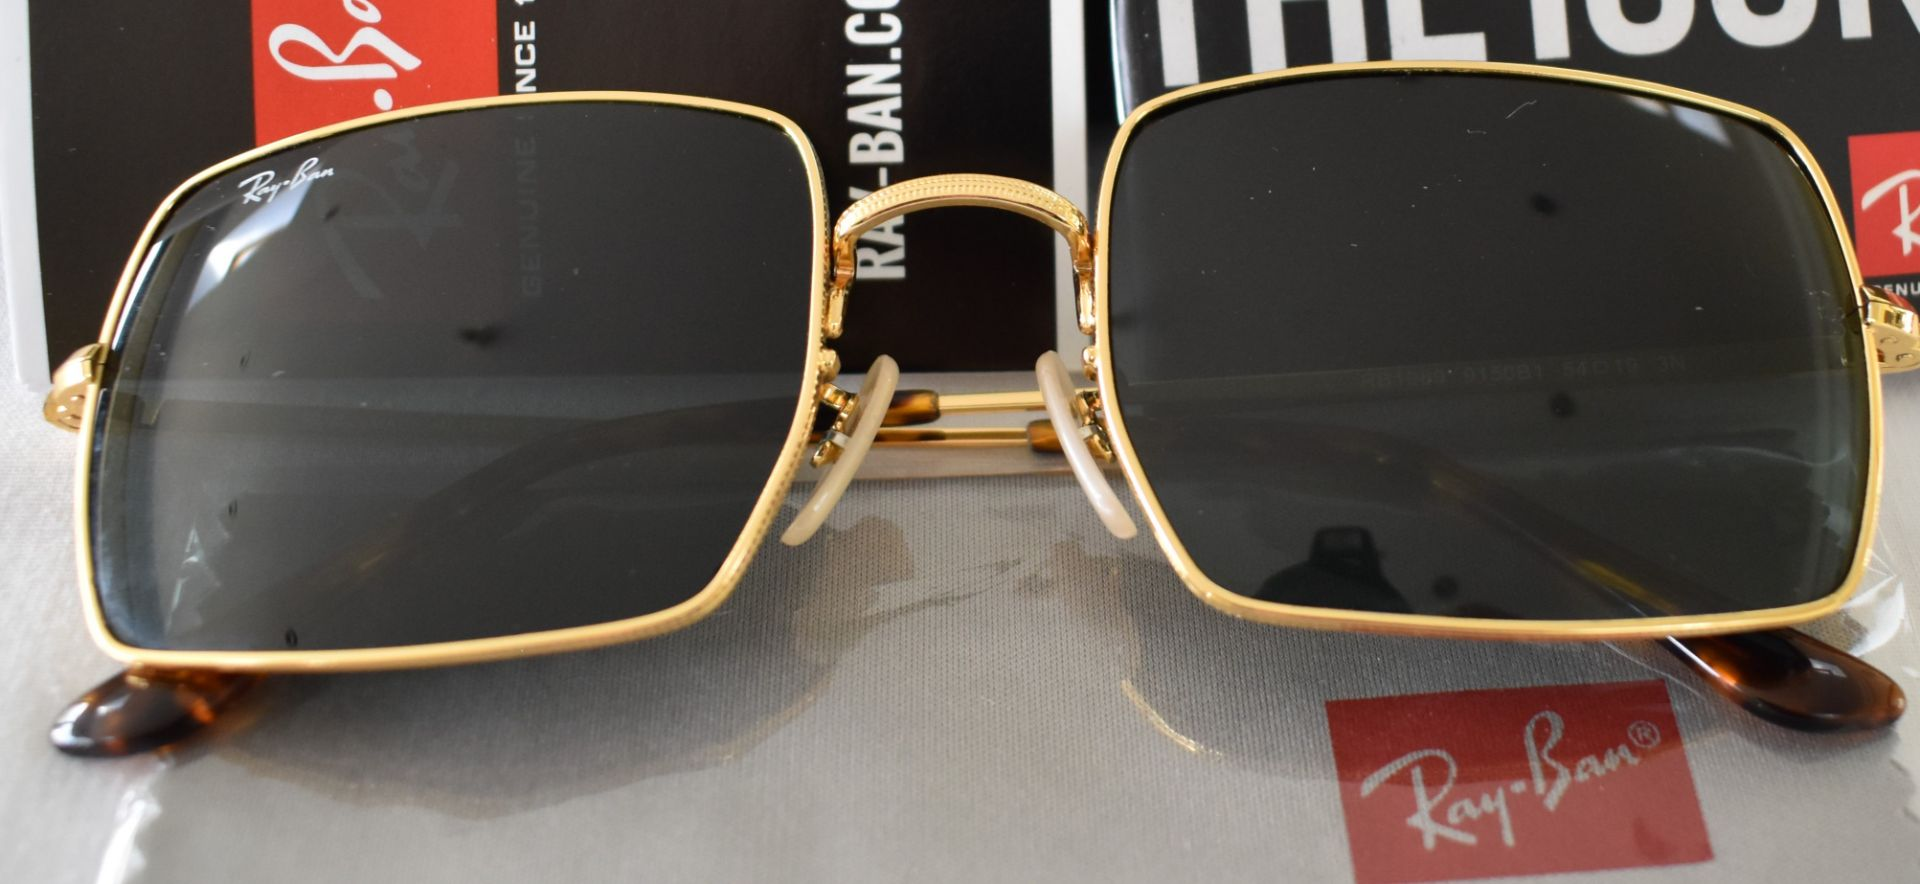 Ray Ban Sunglasses ORB1969 9150B1 *3N - Image 2 of 3